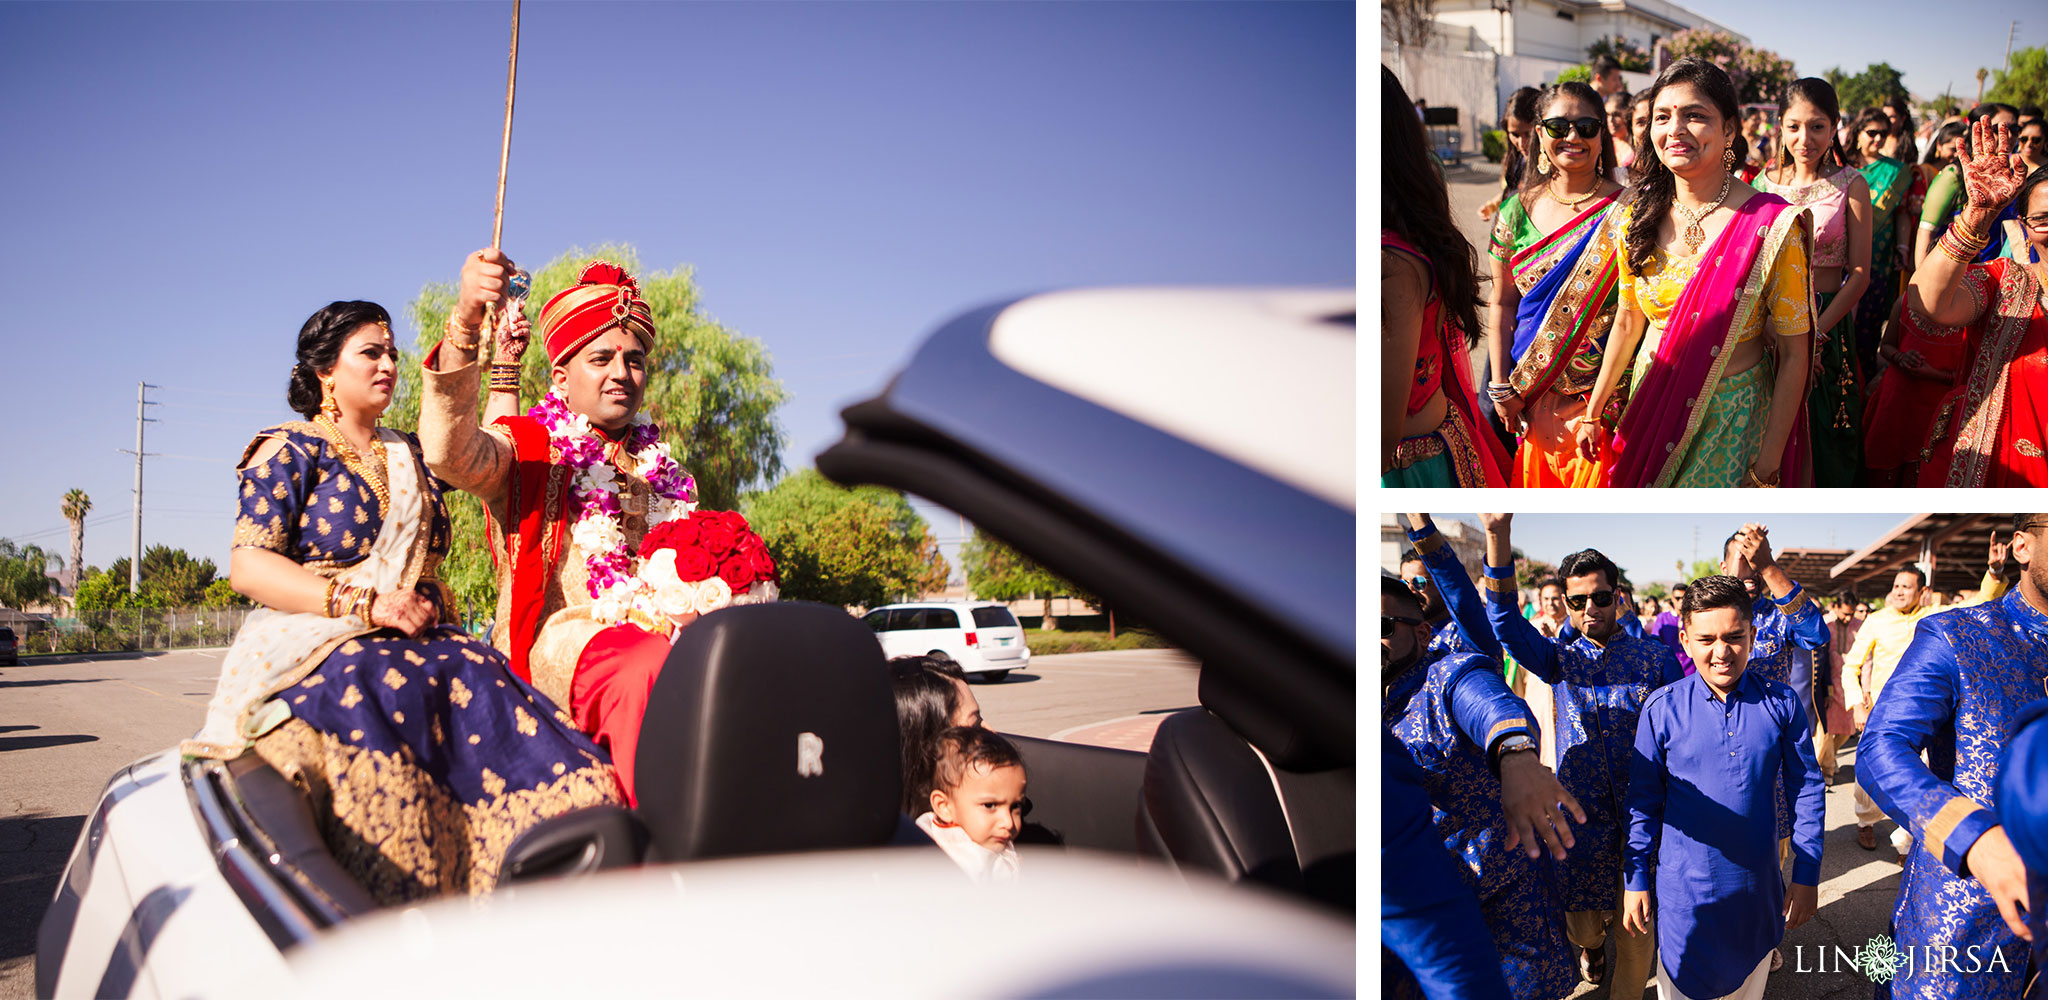 076 BAPS Swaminarayan Sanstha Chino Hills Indian Wedding Photography